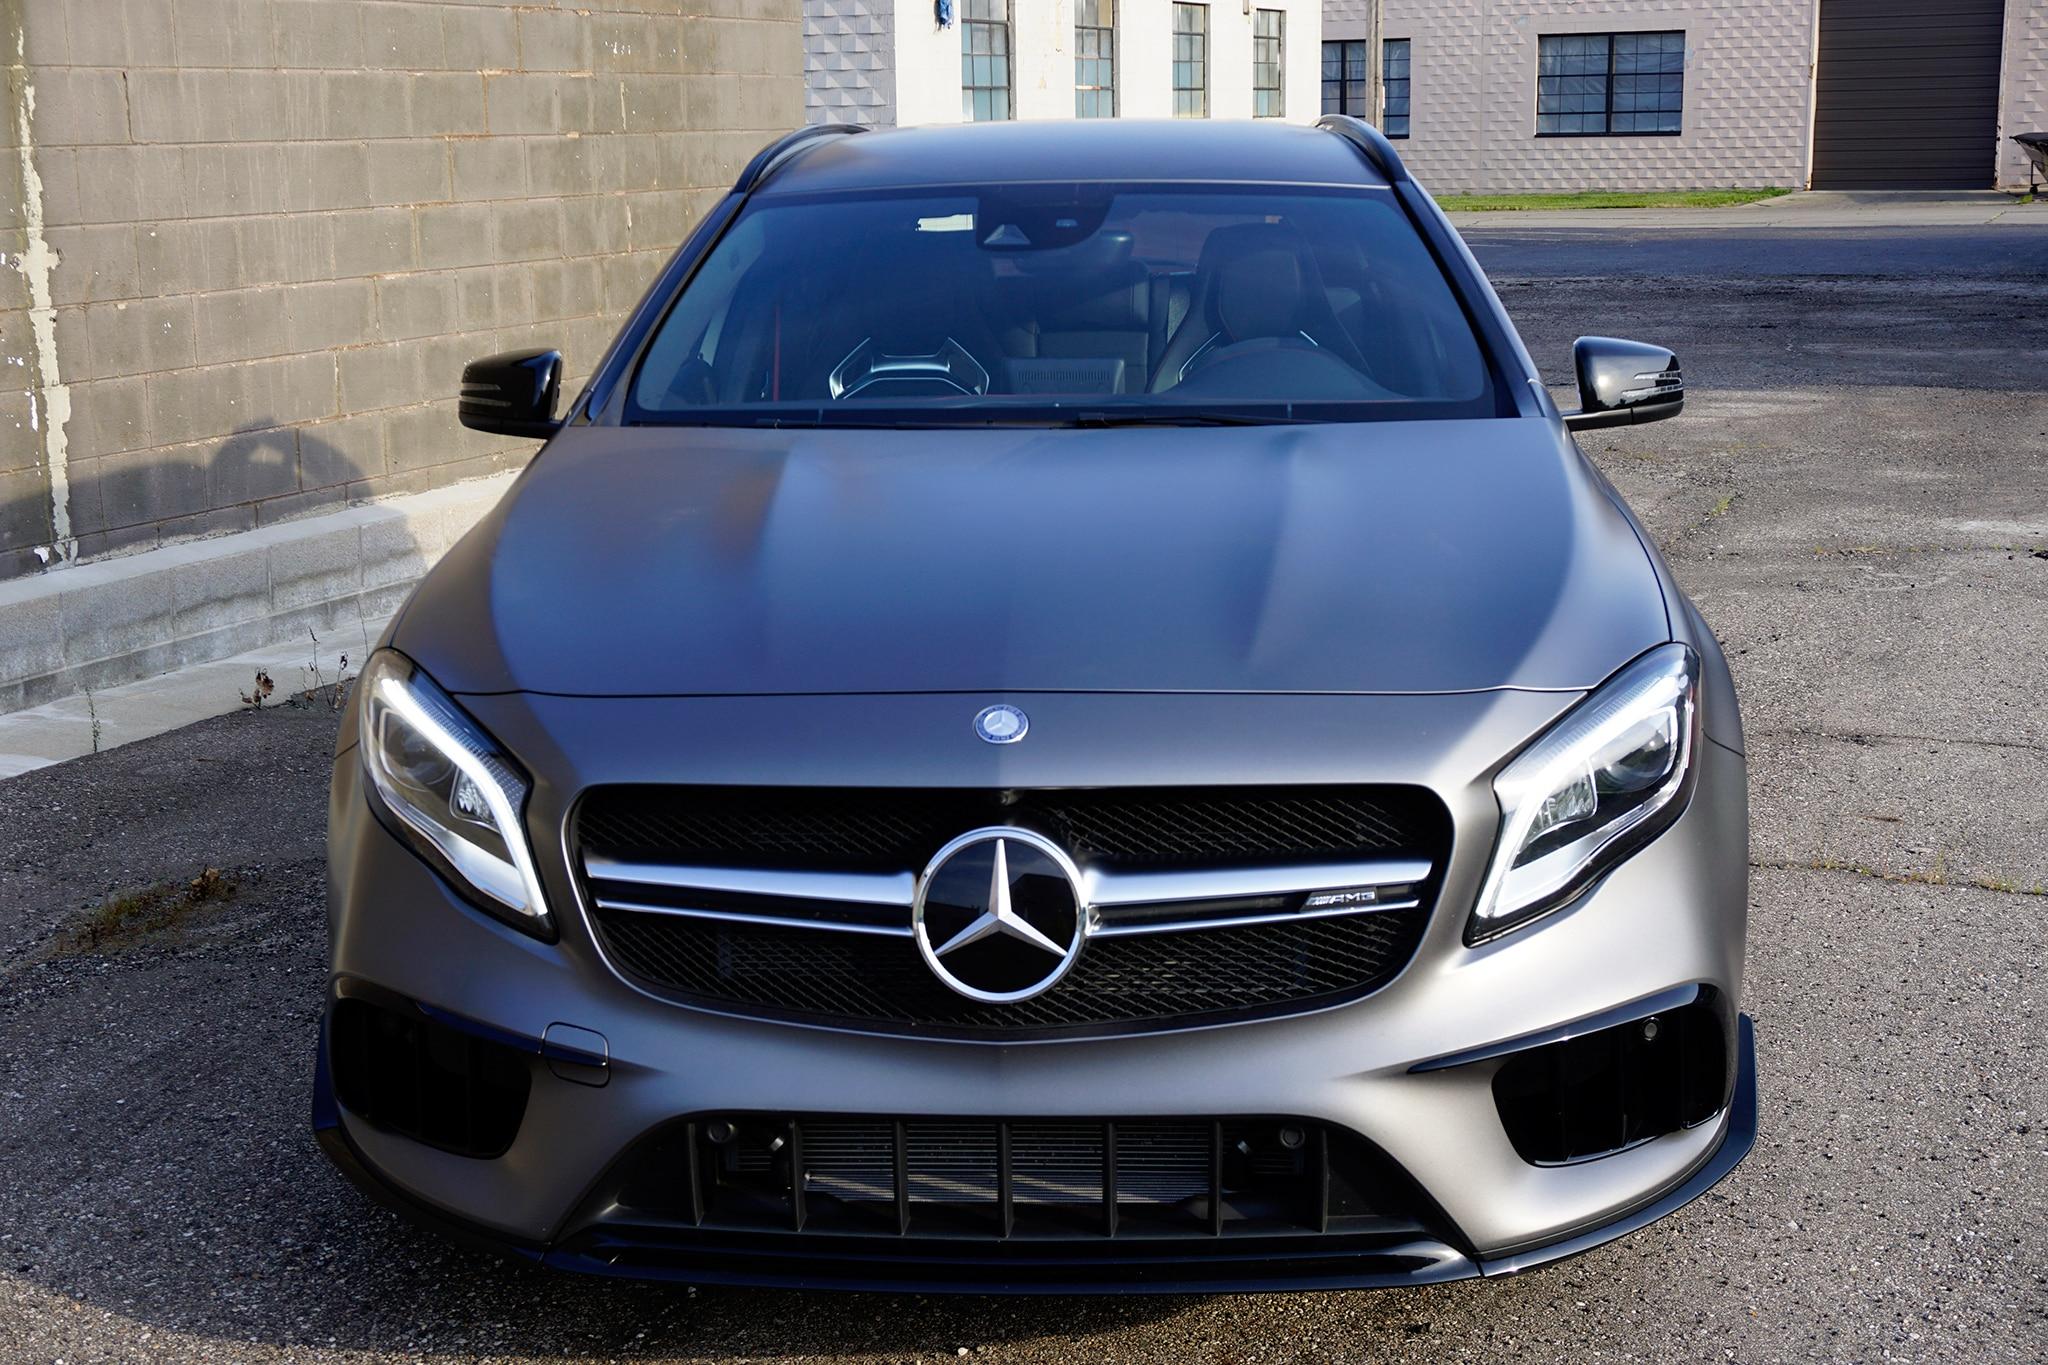 https://st.automobilemag.com/uploads/sites/11/2017/08/2018-Mercedes-AMG-GLA45-front-view.jpg